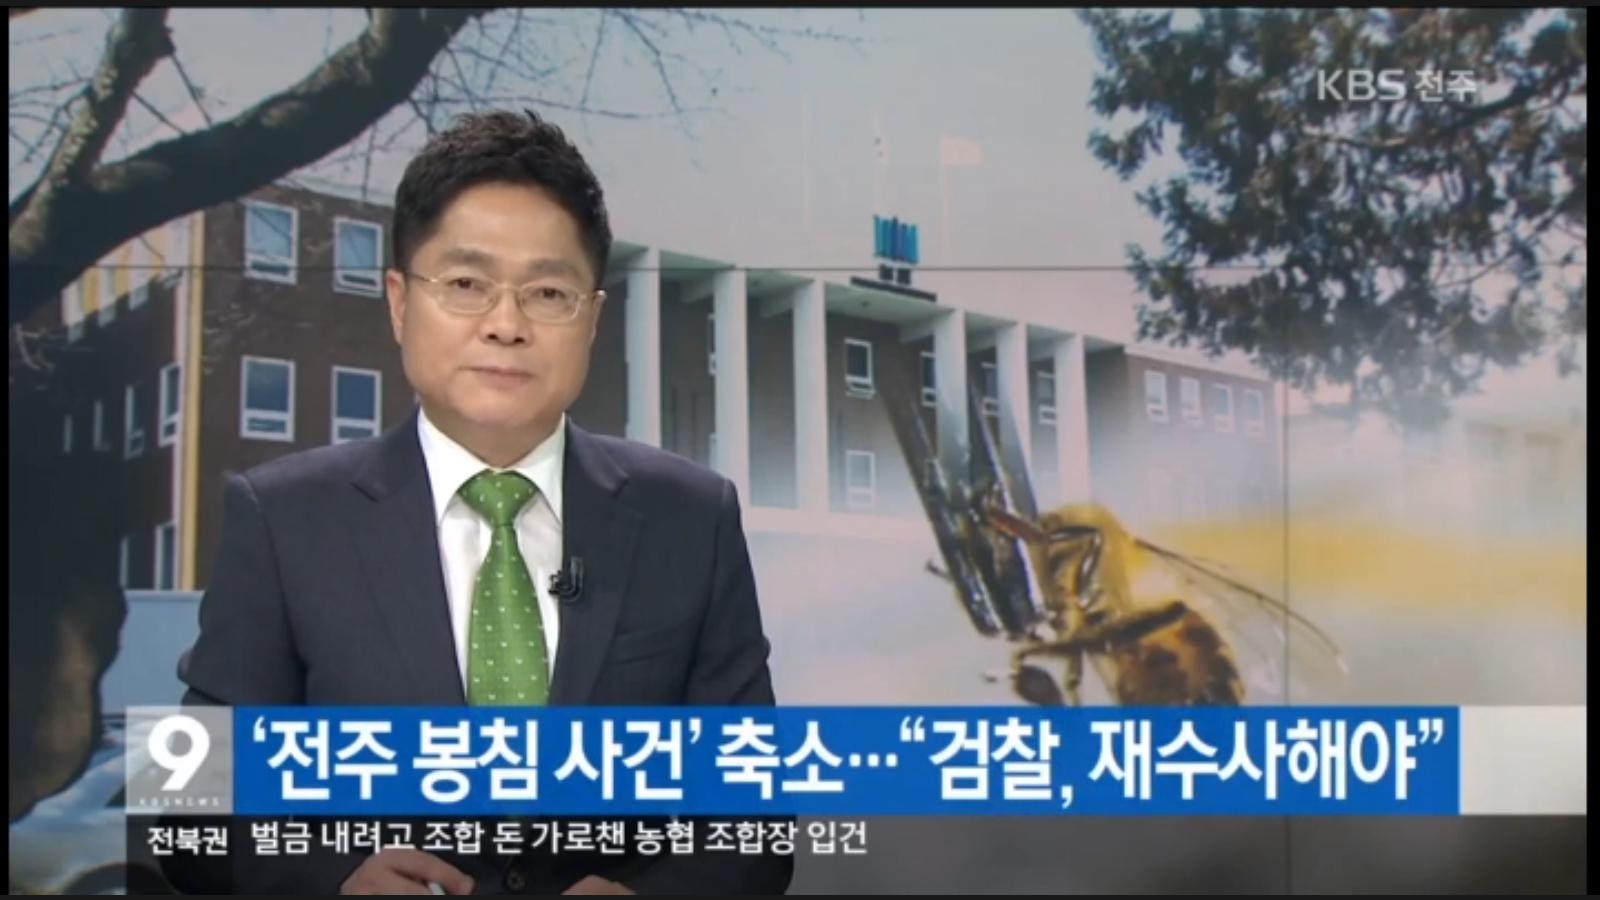 [18.3.30 KBS전주] 전주 봉침게이트, 재산 형성은..후원금검찰 사건축소..재수사 해야8.jpg